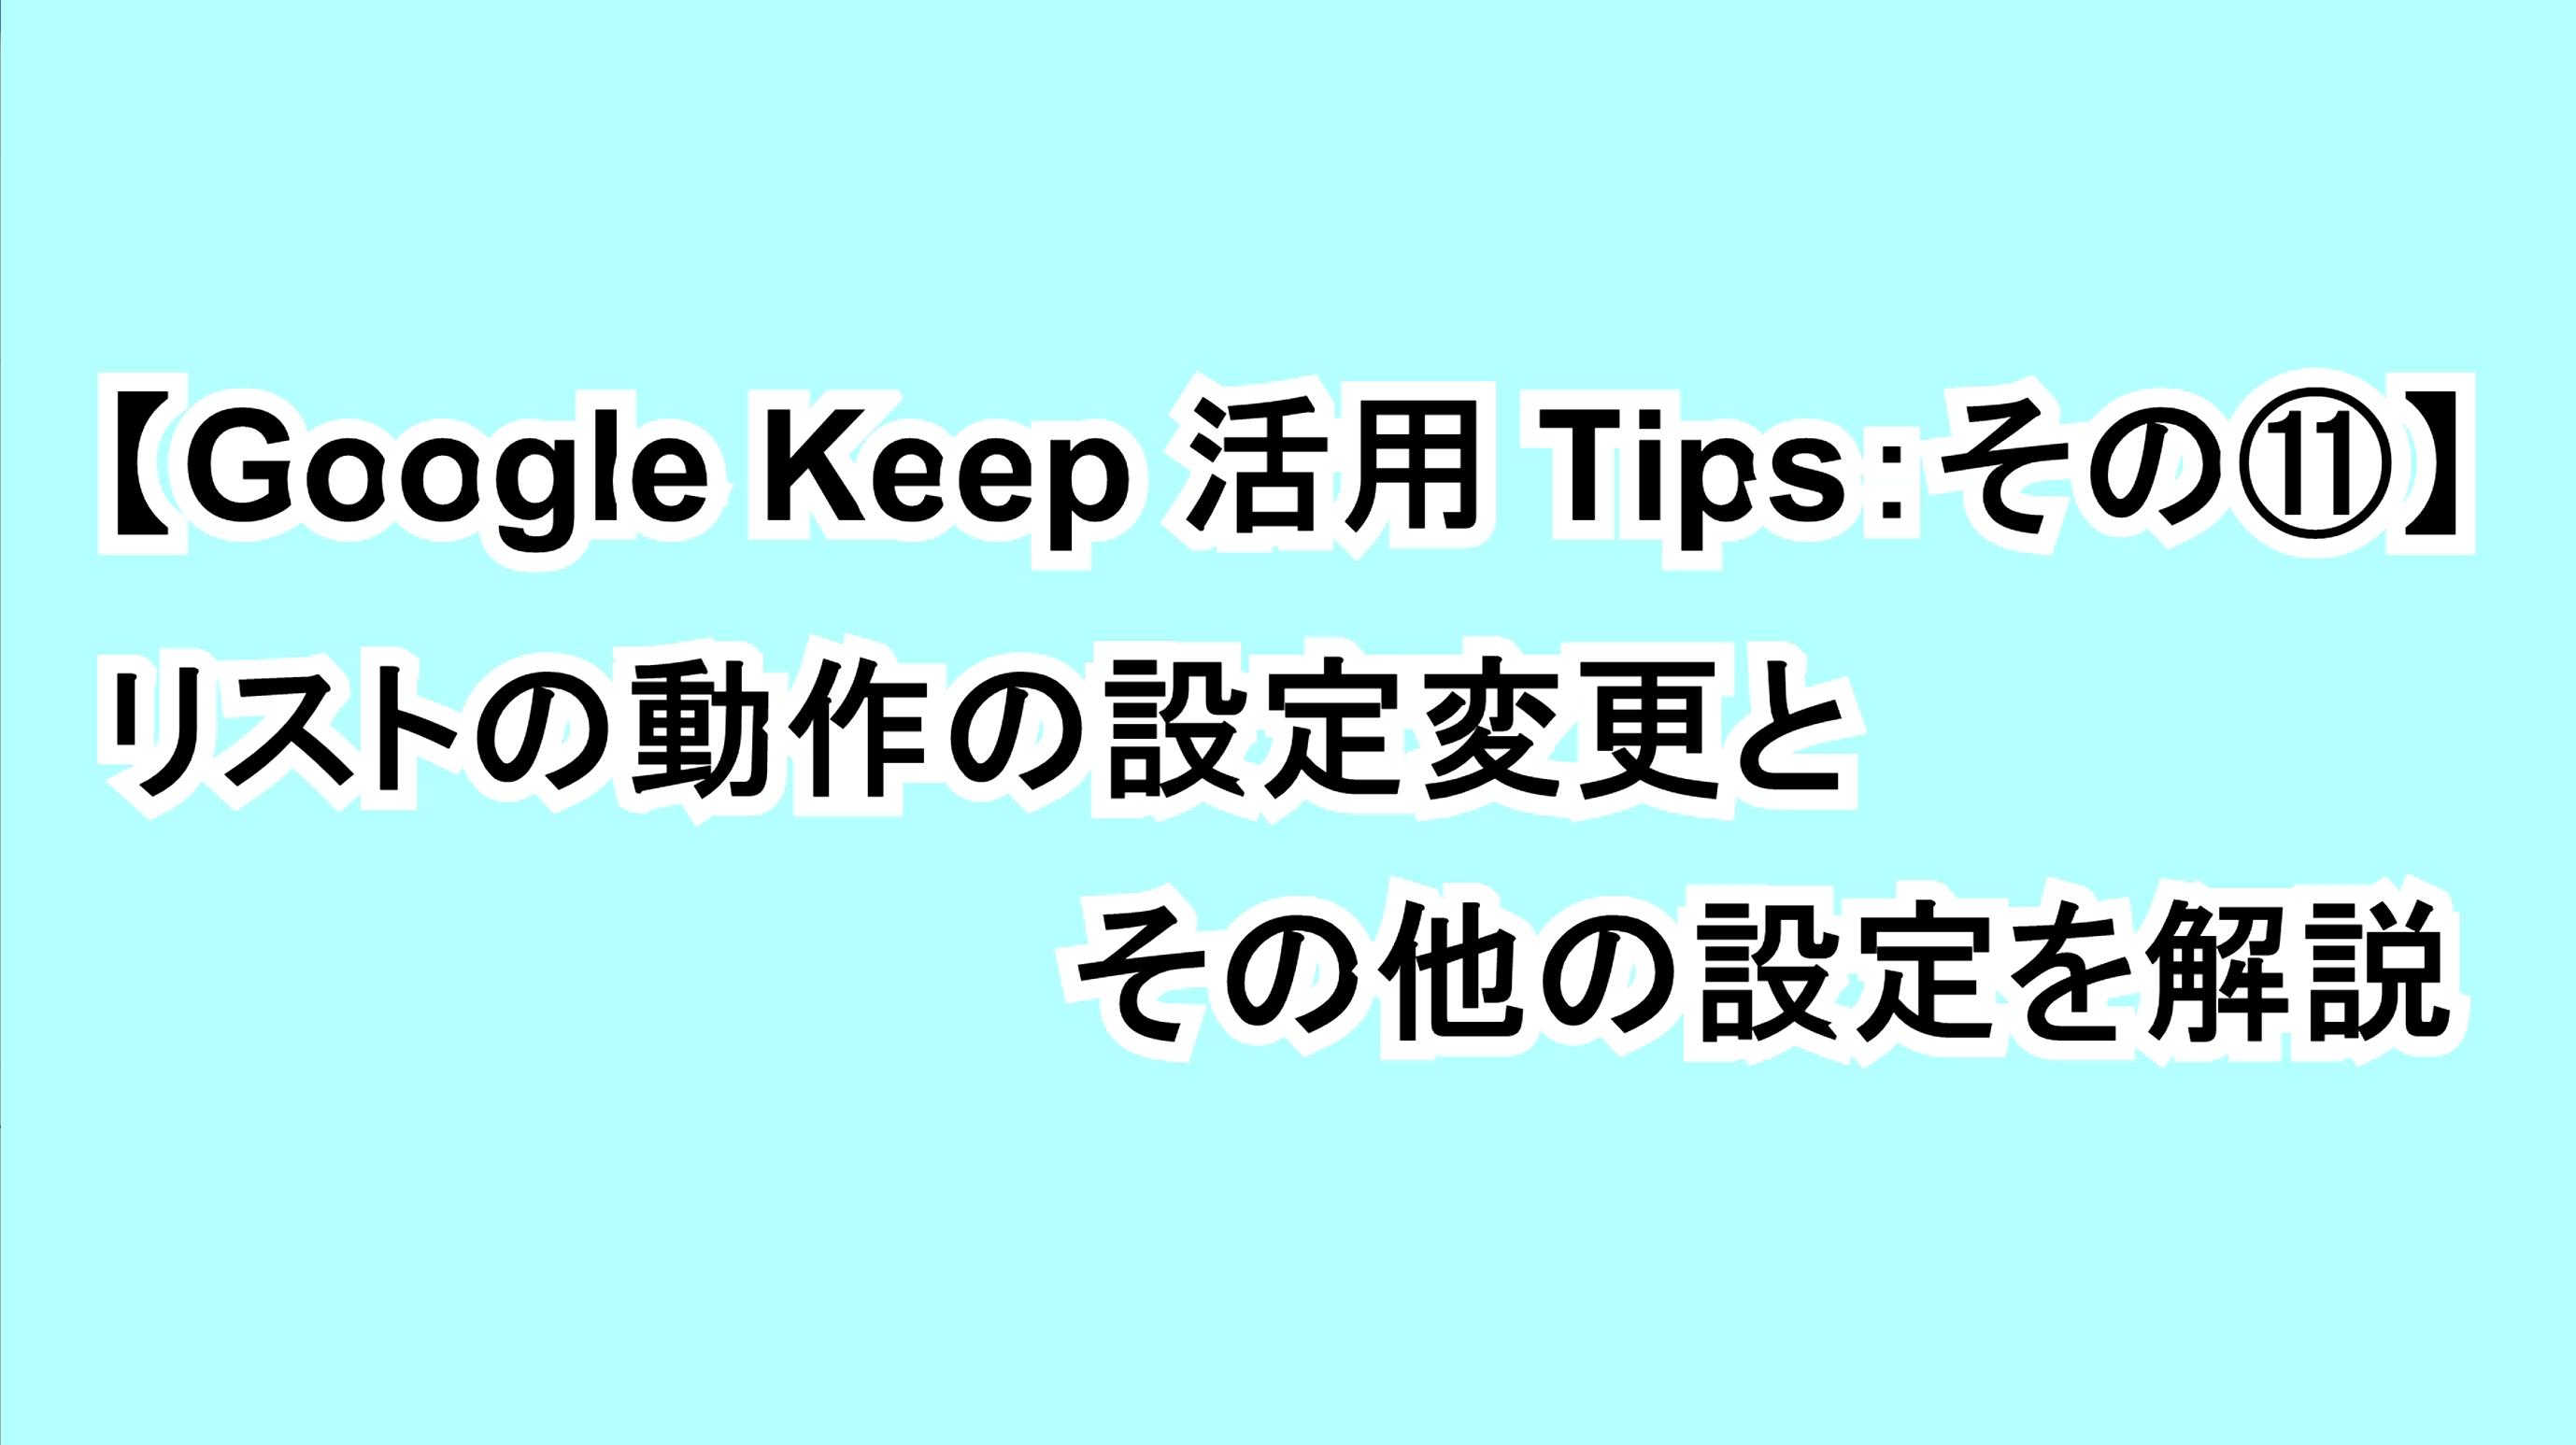 【Google Keep活用Tips:その⑪】リストの動作の設定変更とその他の設定を解説